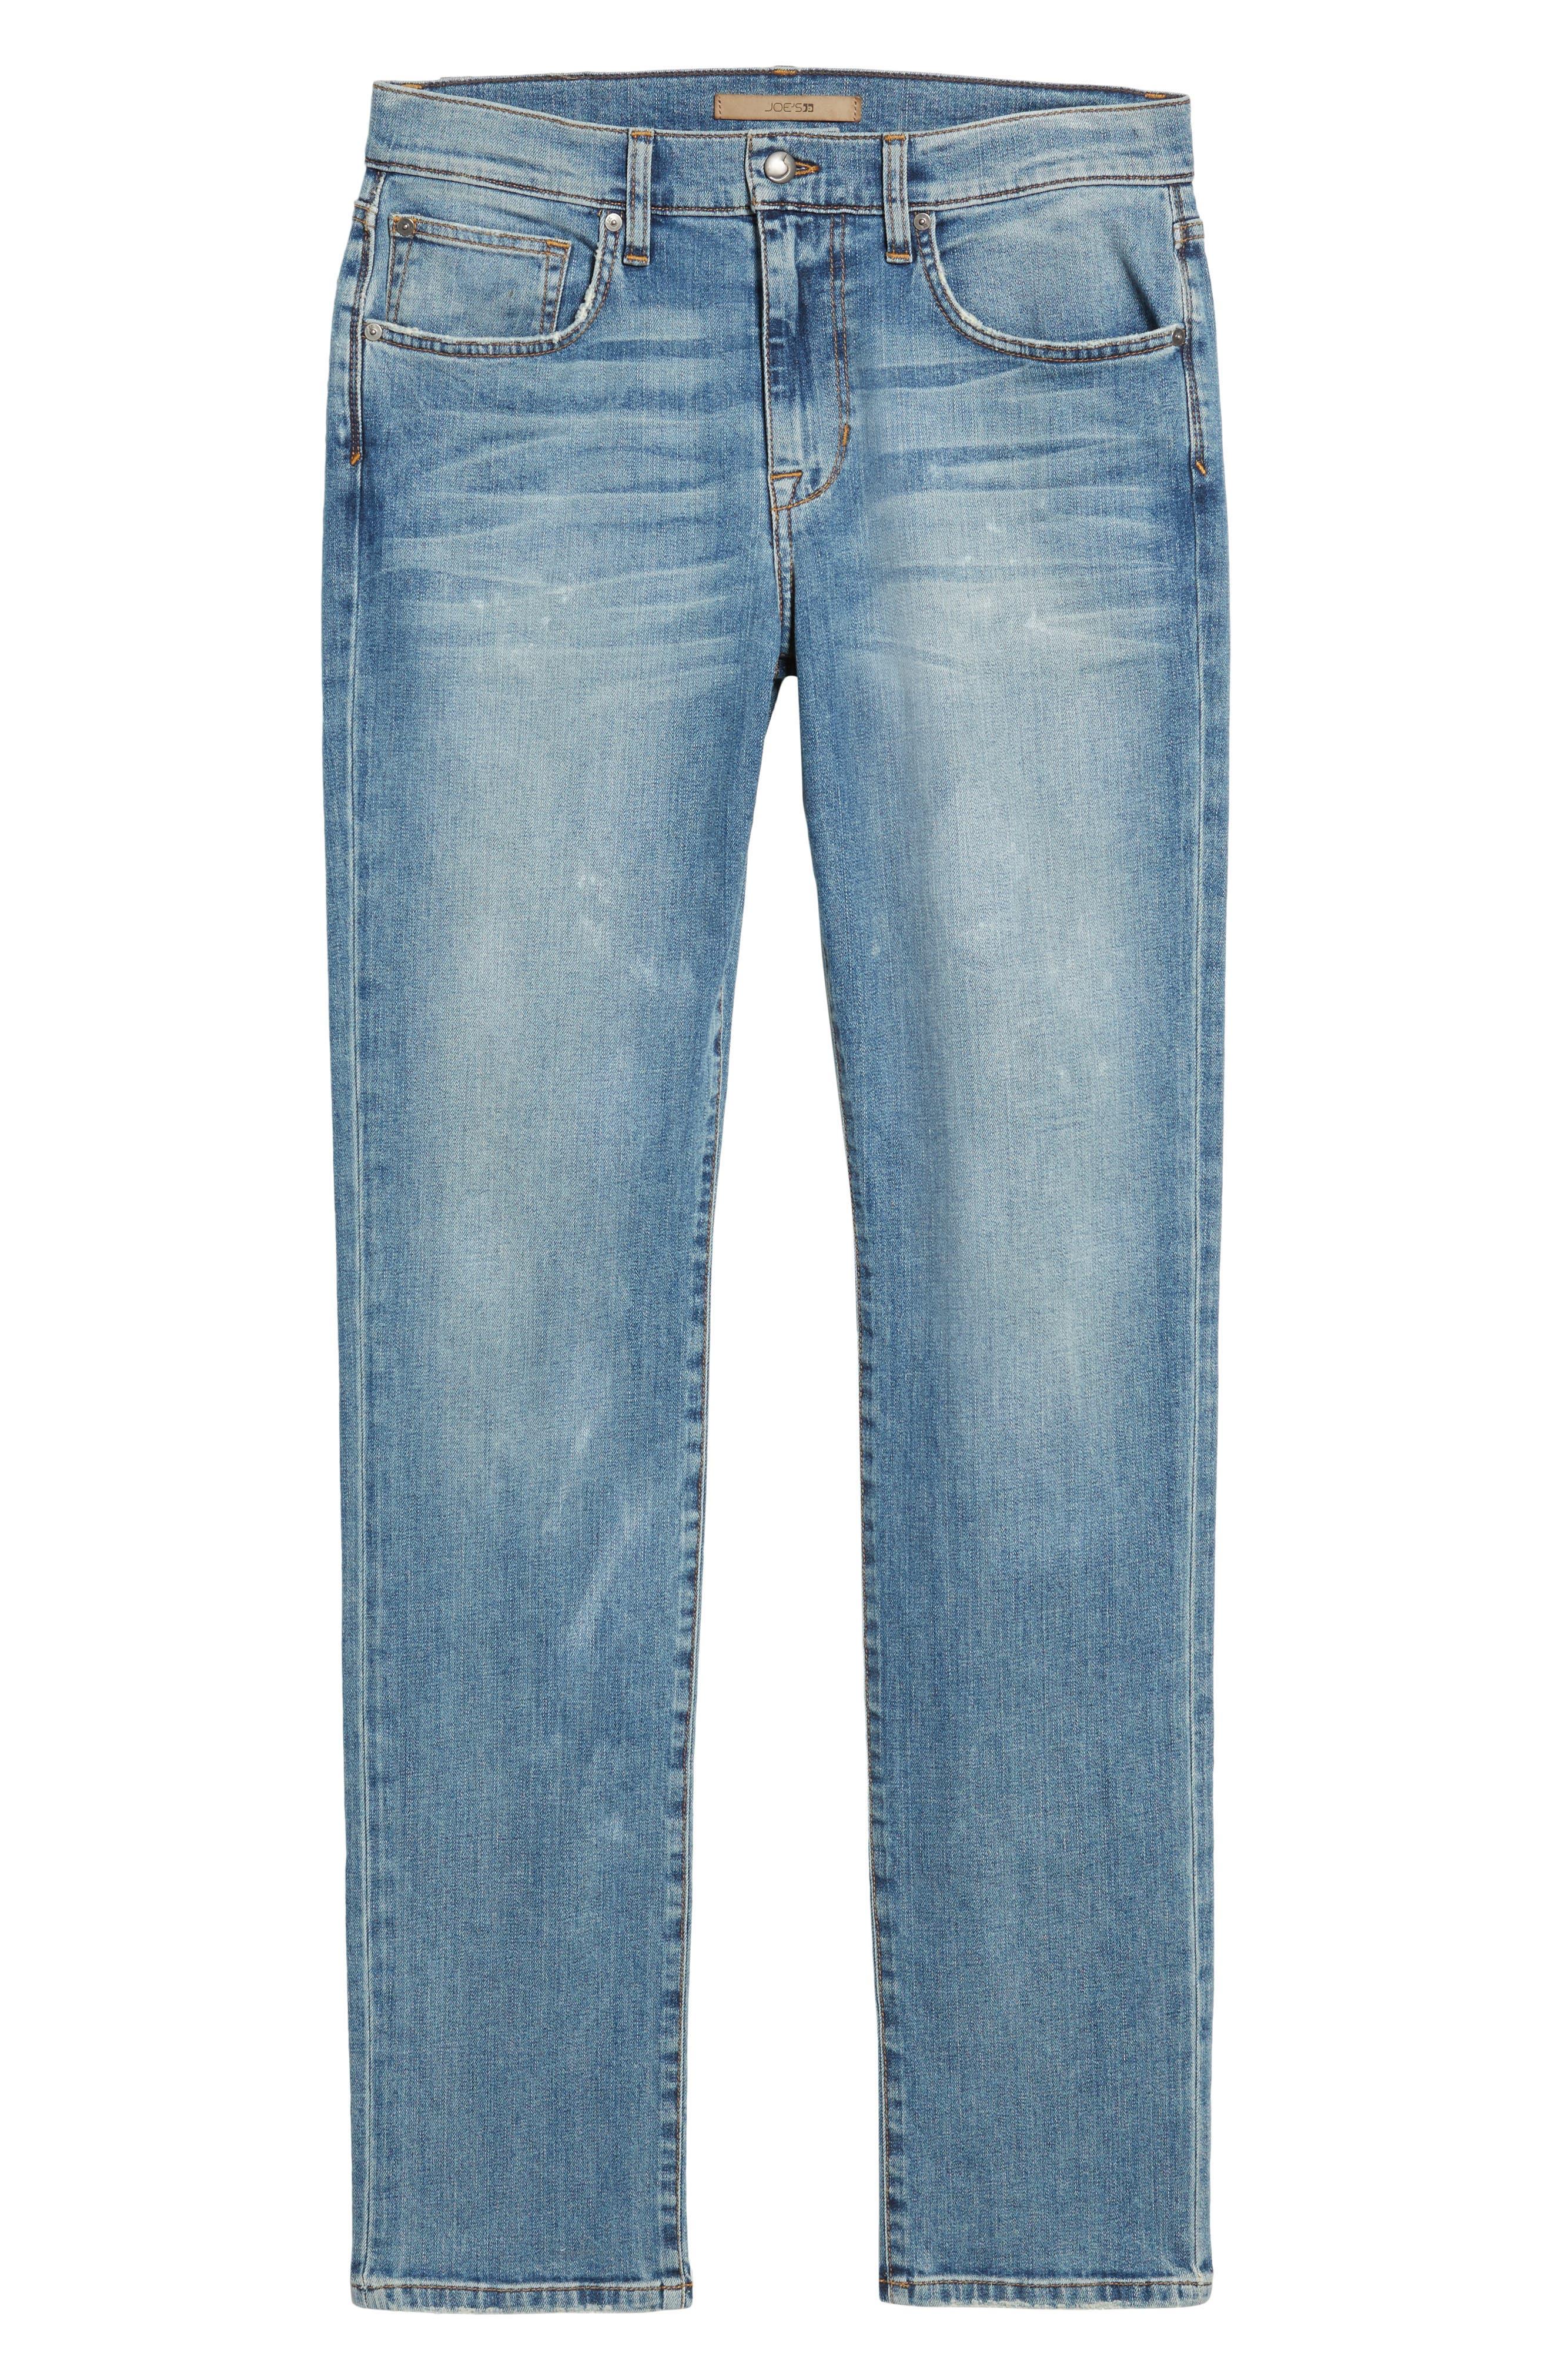 Brixton Slim Straight Fit Jeans,                             Alternate thumbnail 6, color,                             475